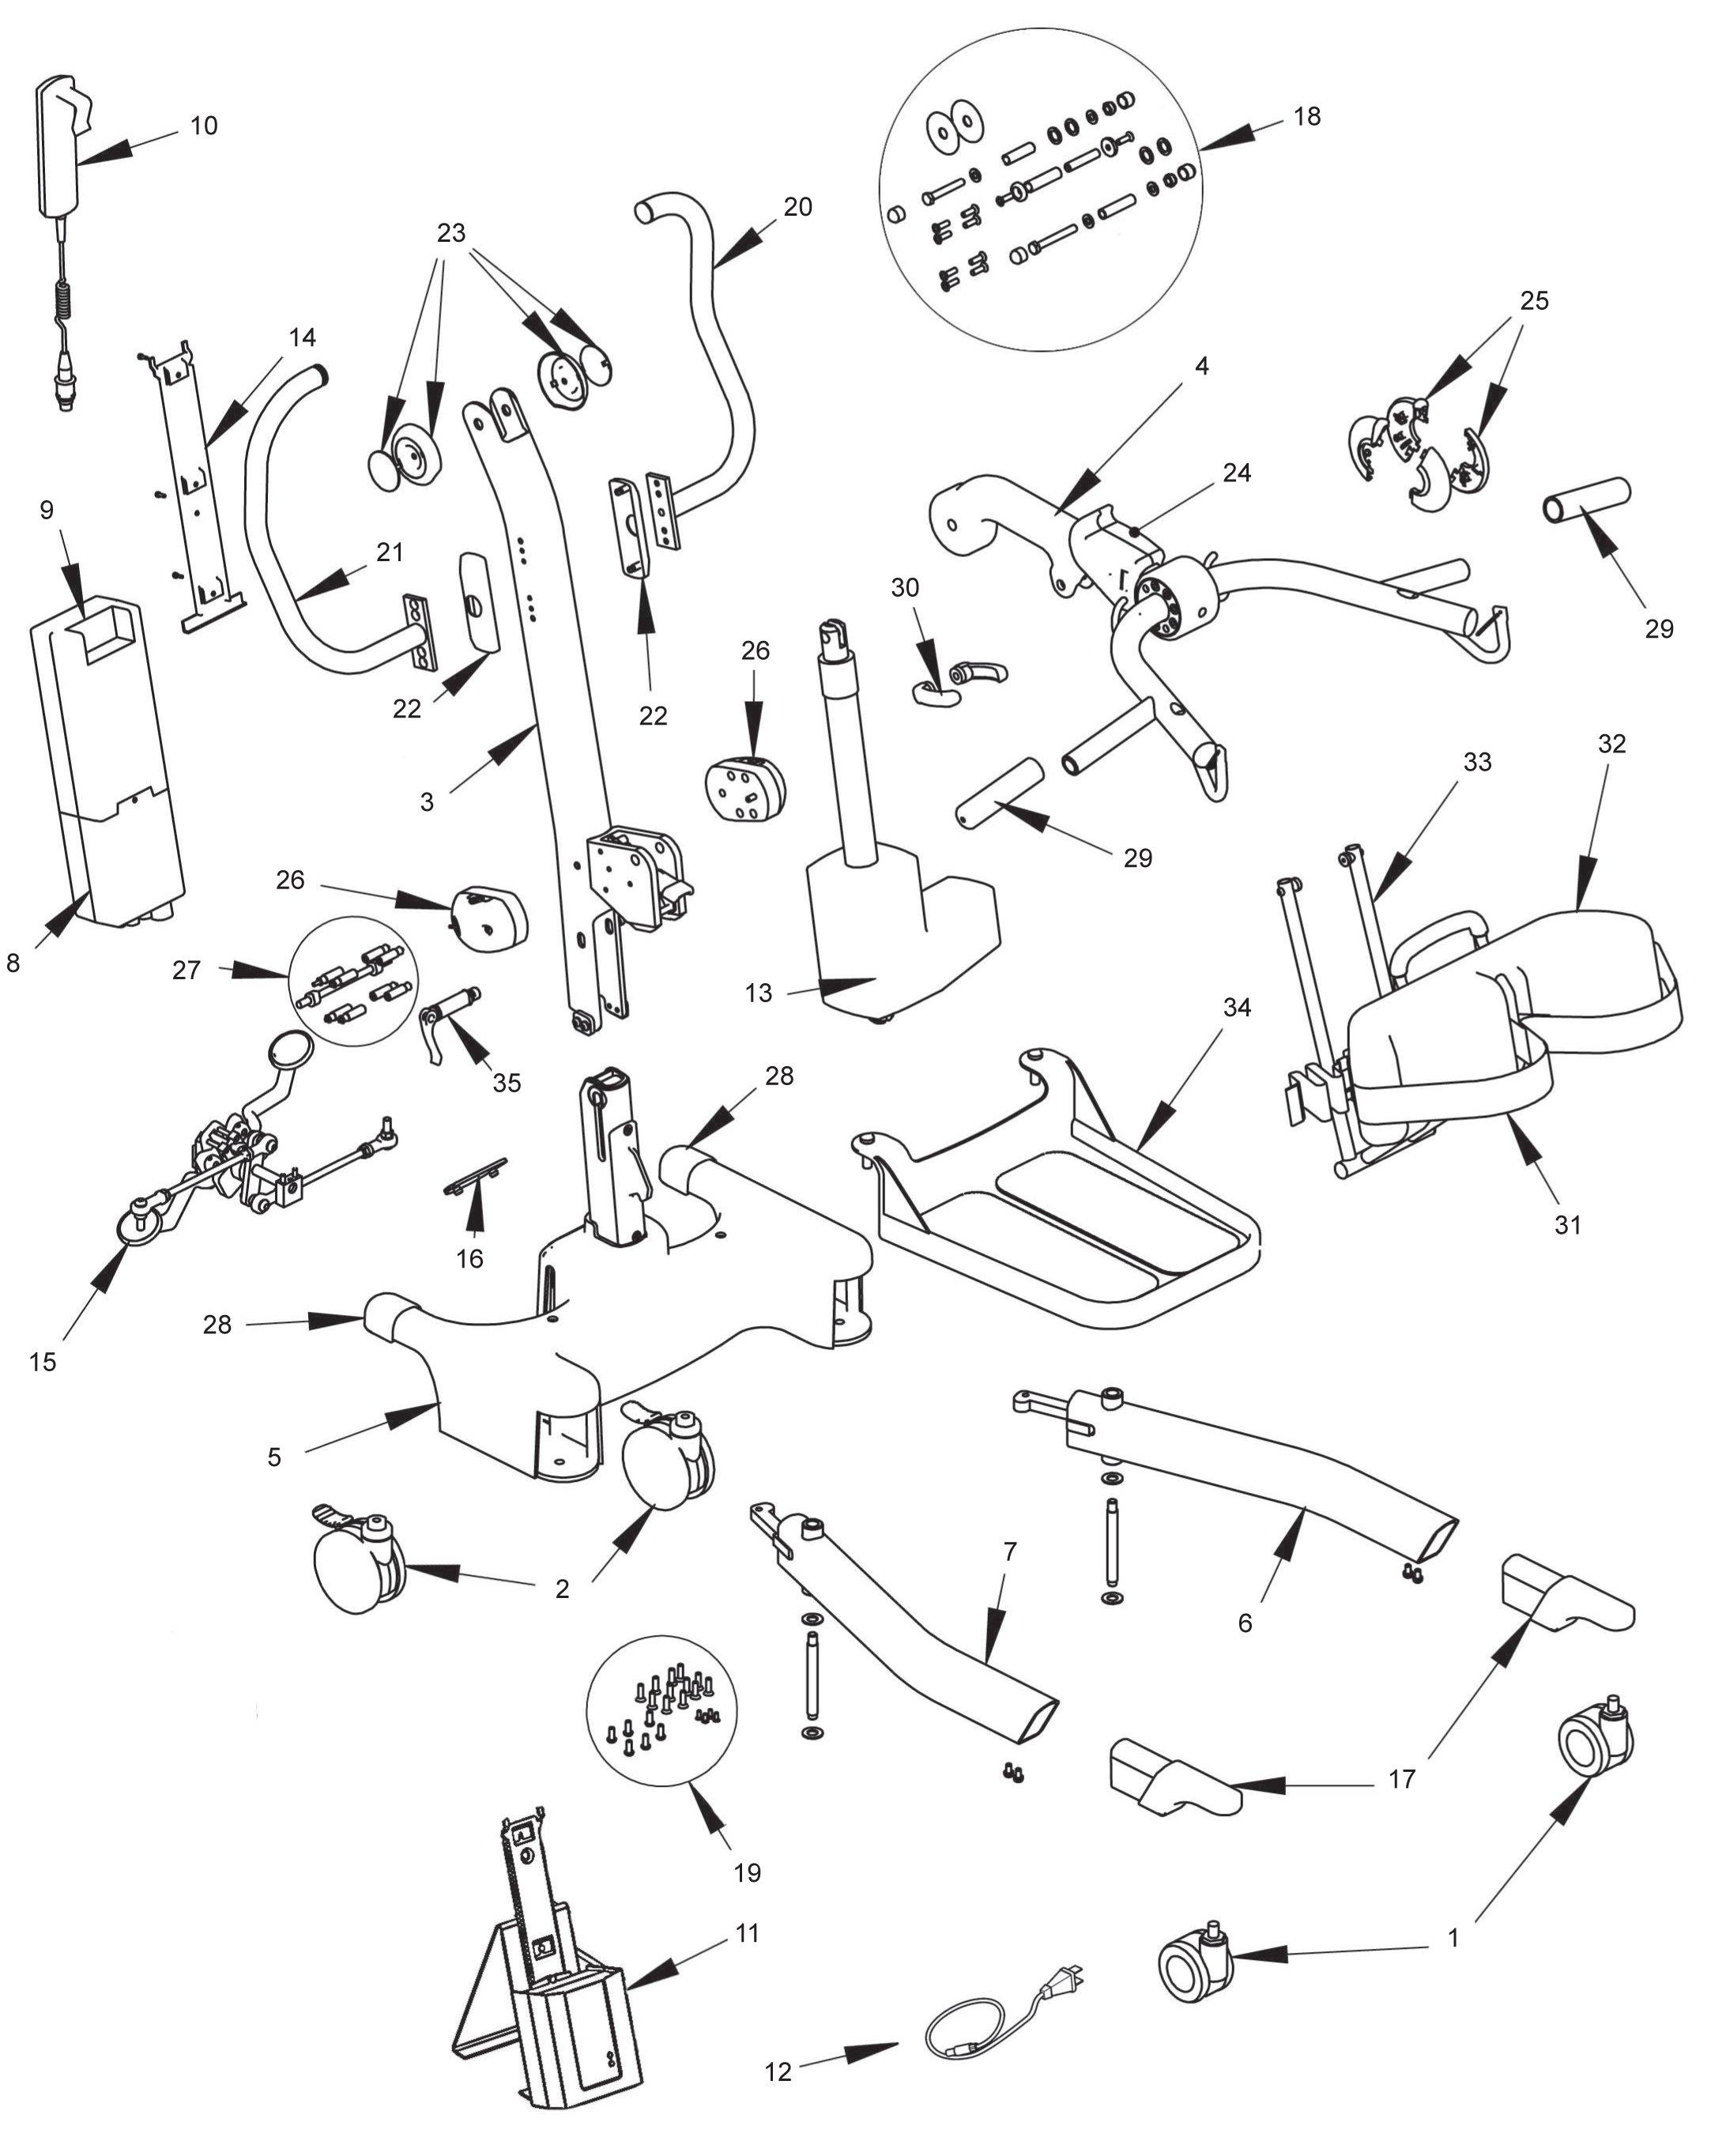 Lift Parts - QuickFind